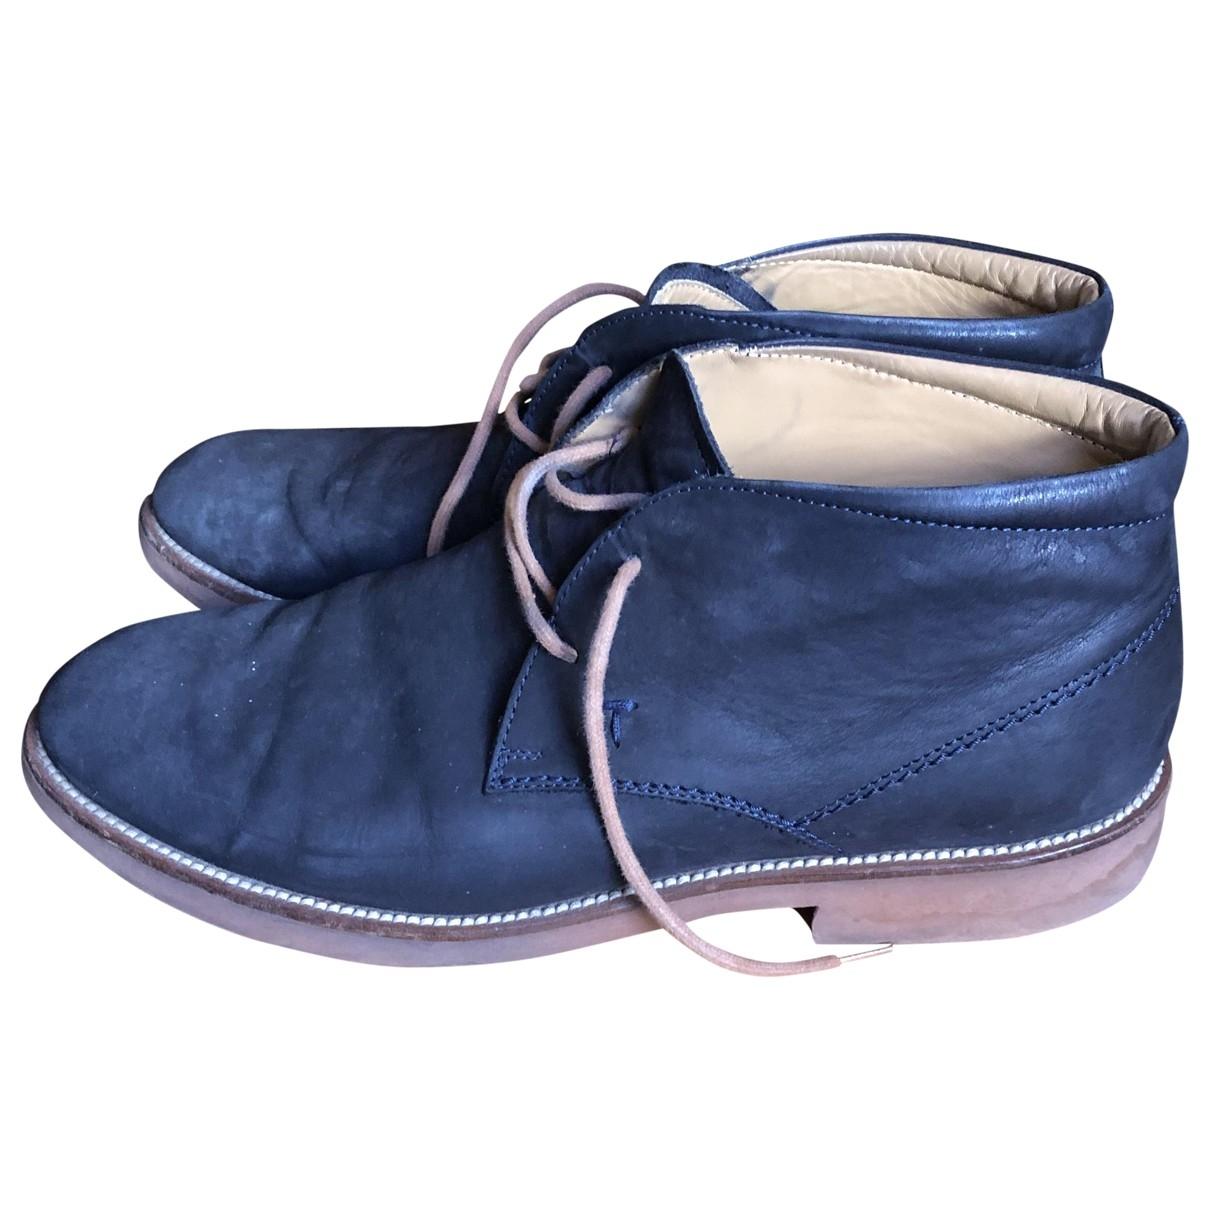 Tods \N Stiefel in  Marine Leder